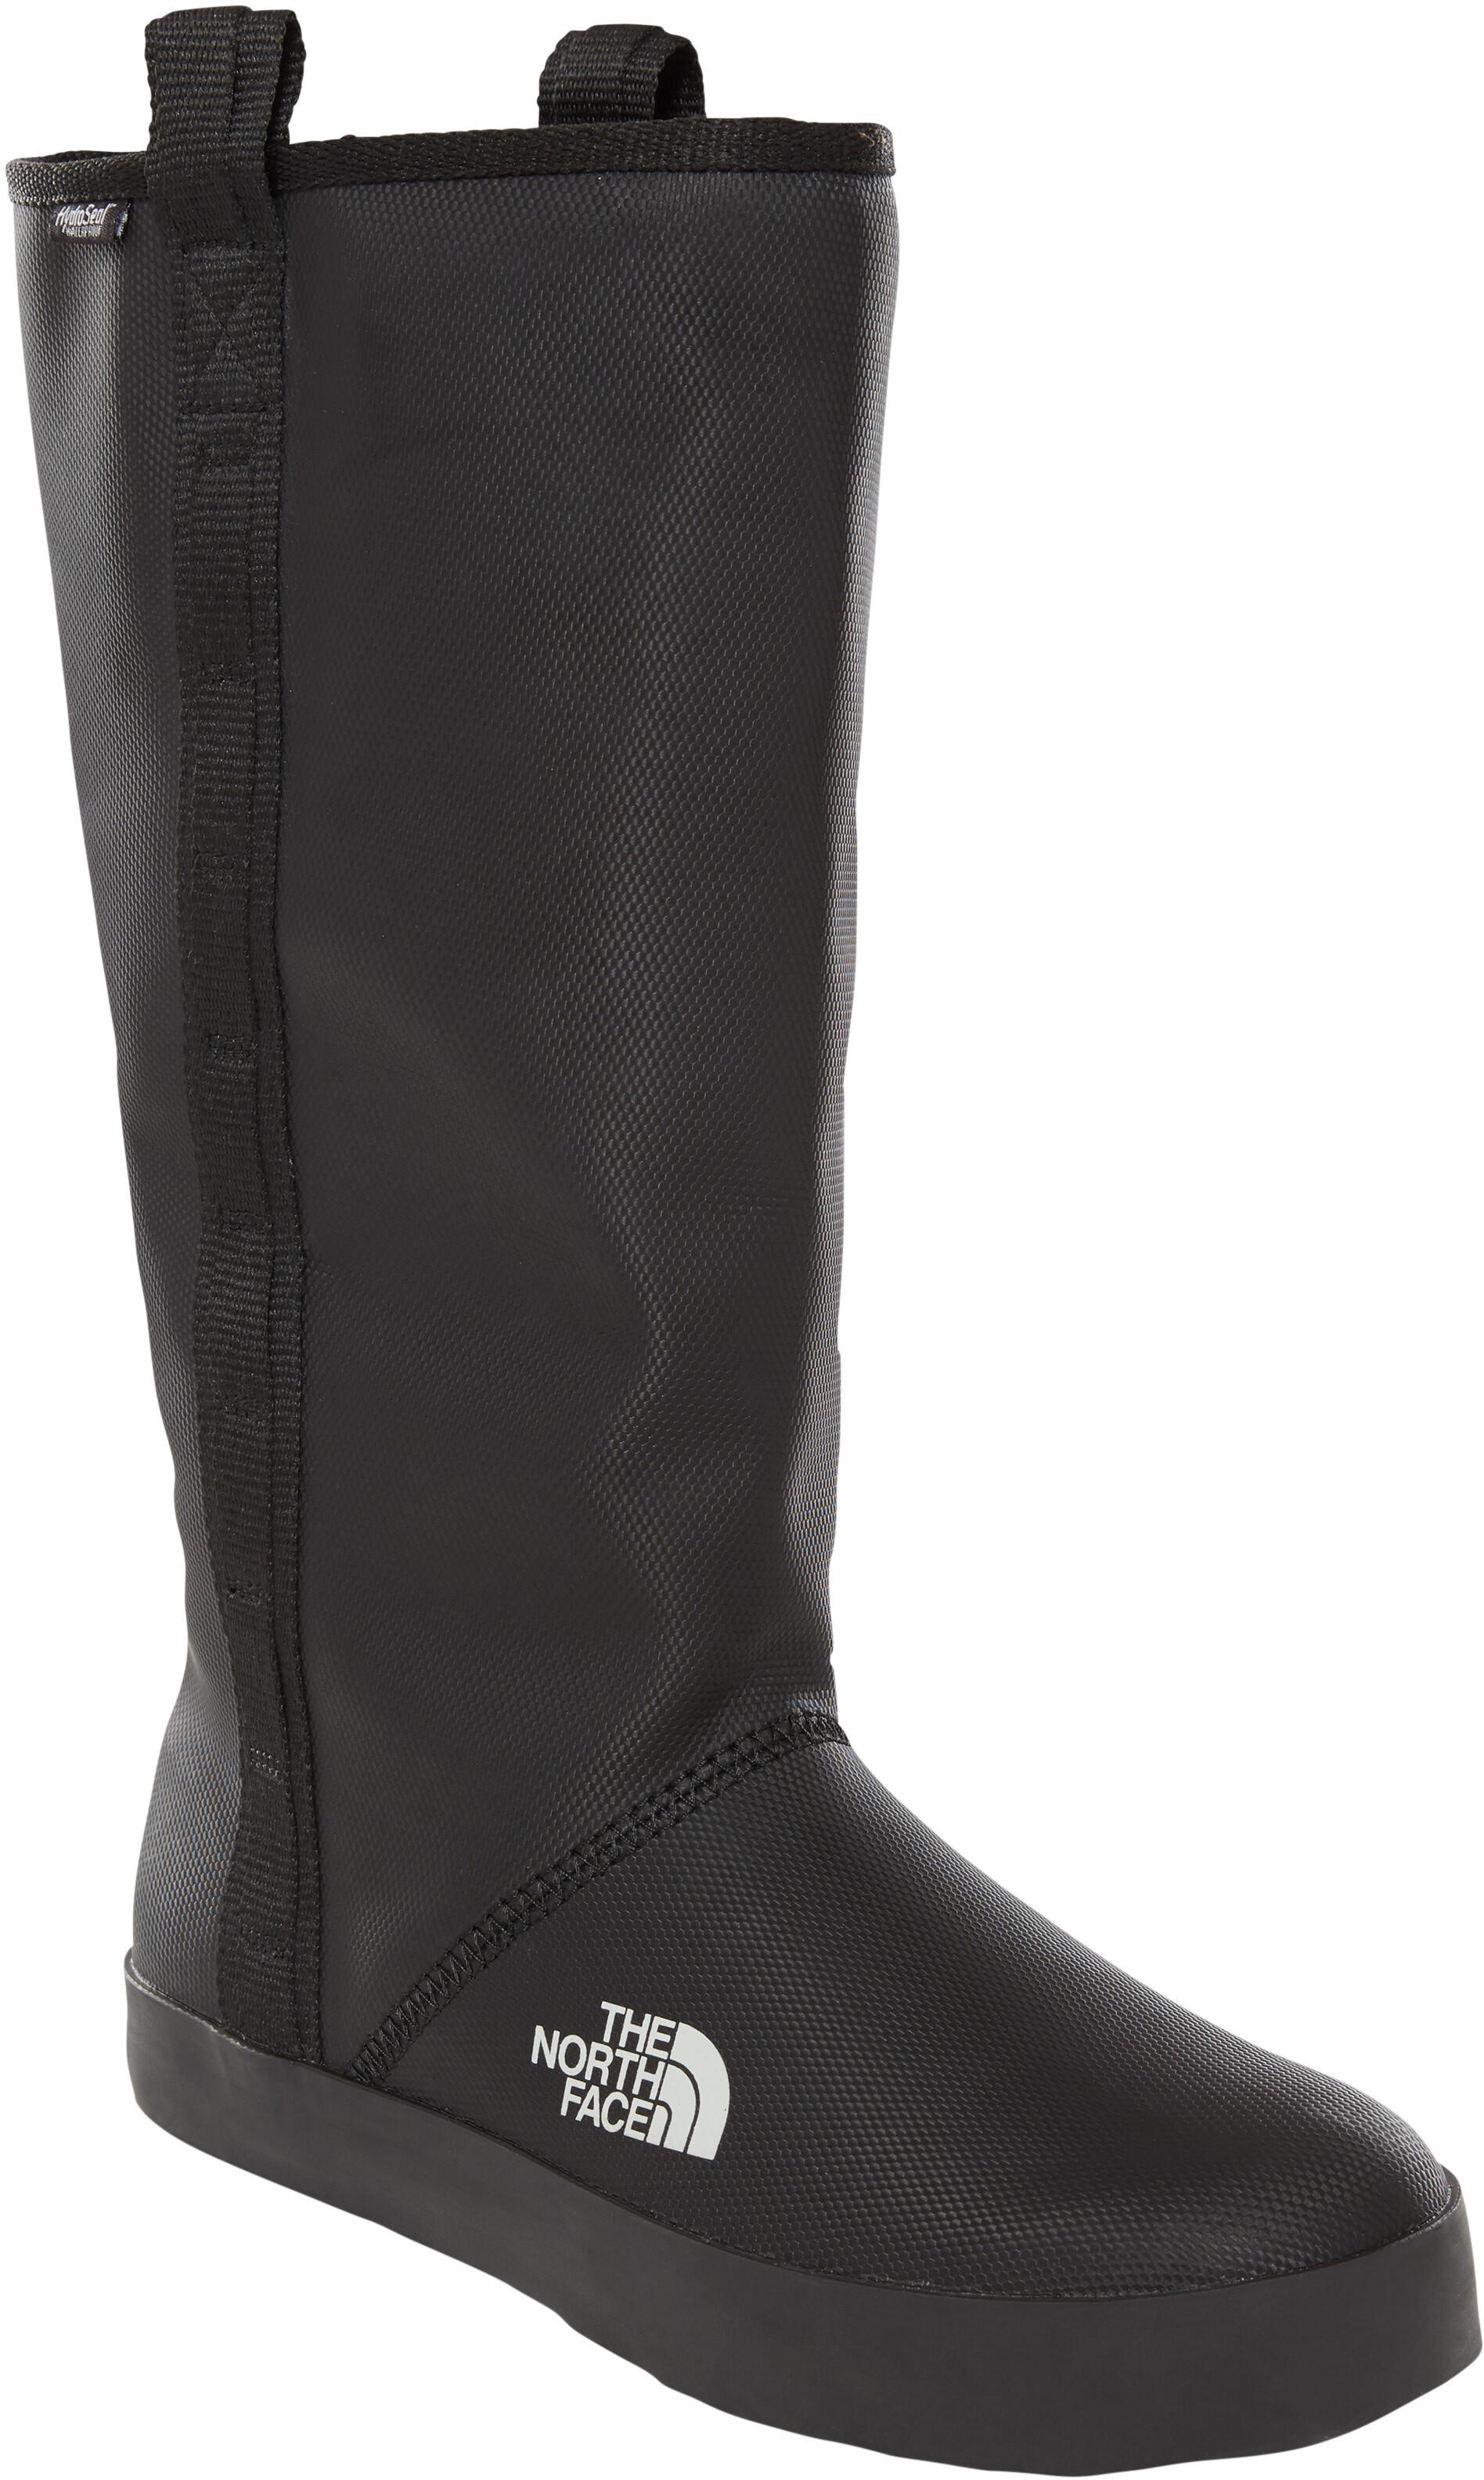 faf260789 The North Face Basecamp Rain Boots Women tnf black/tin grey